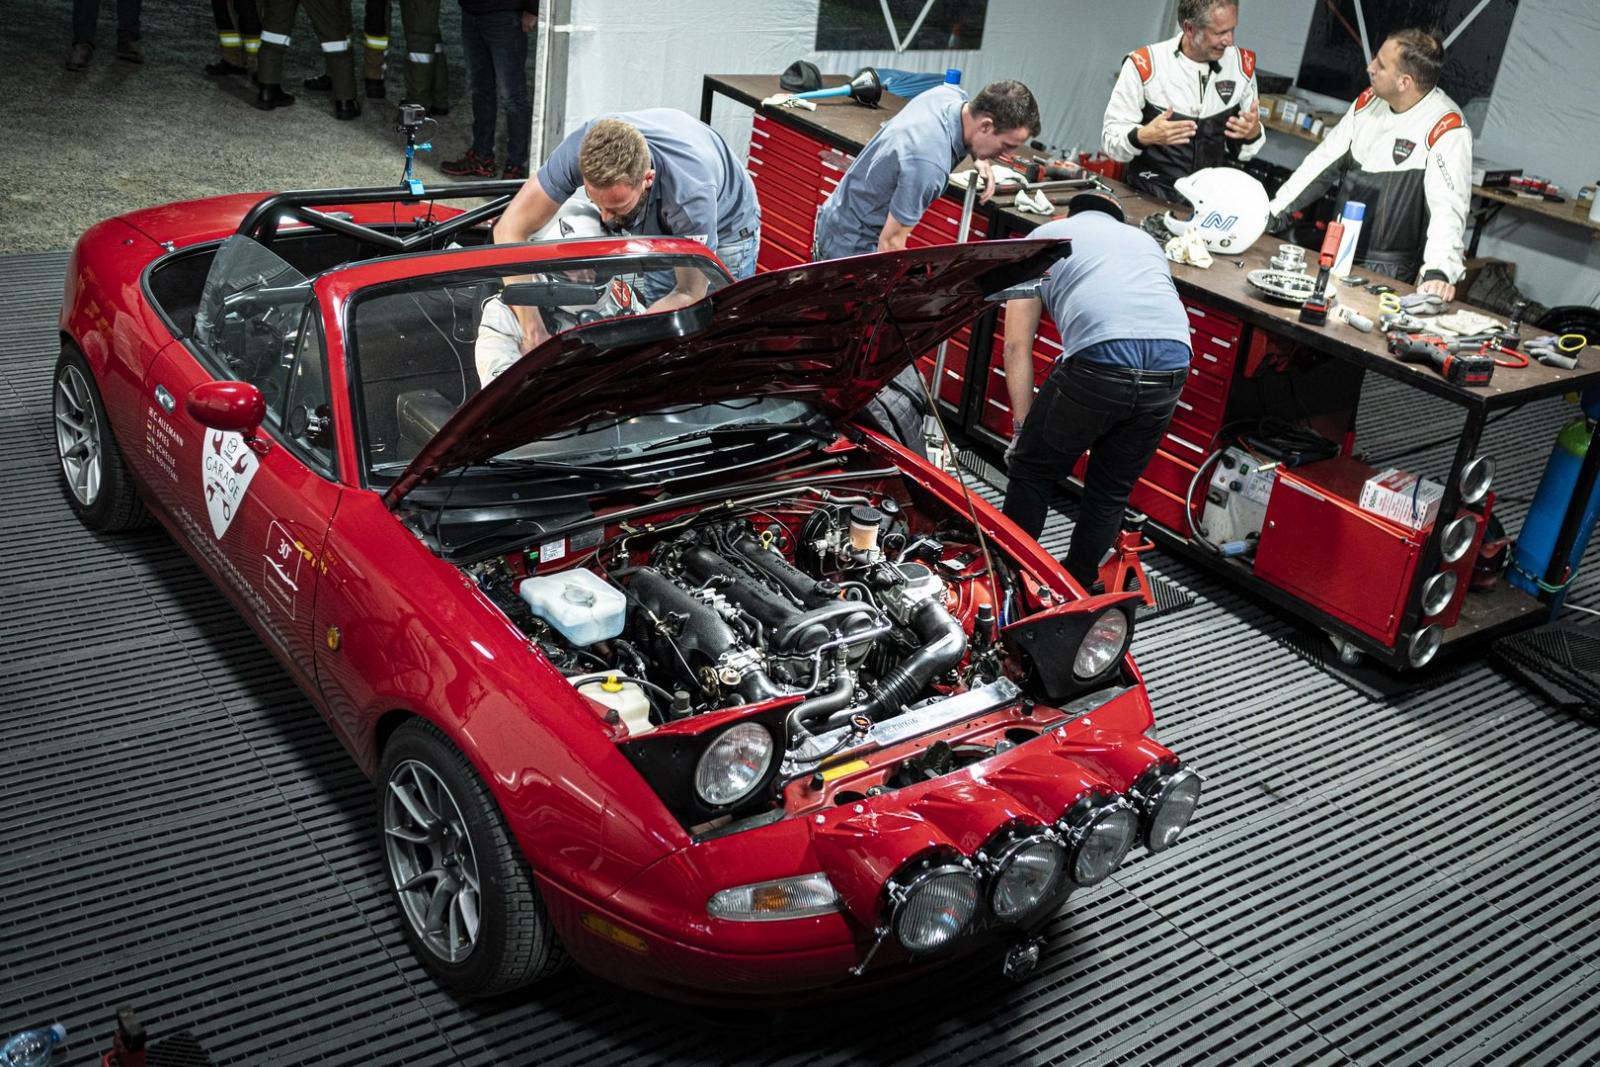 Mazda MX-5 hajtűkanyar rekord